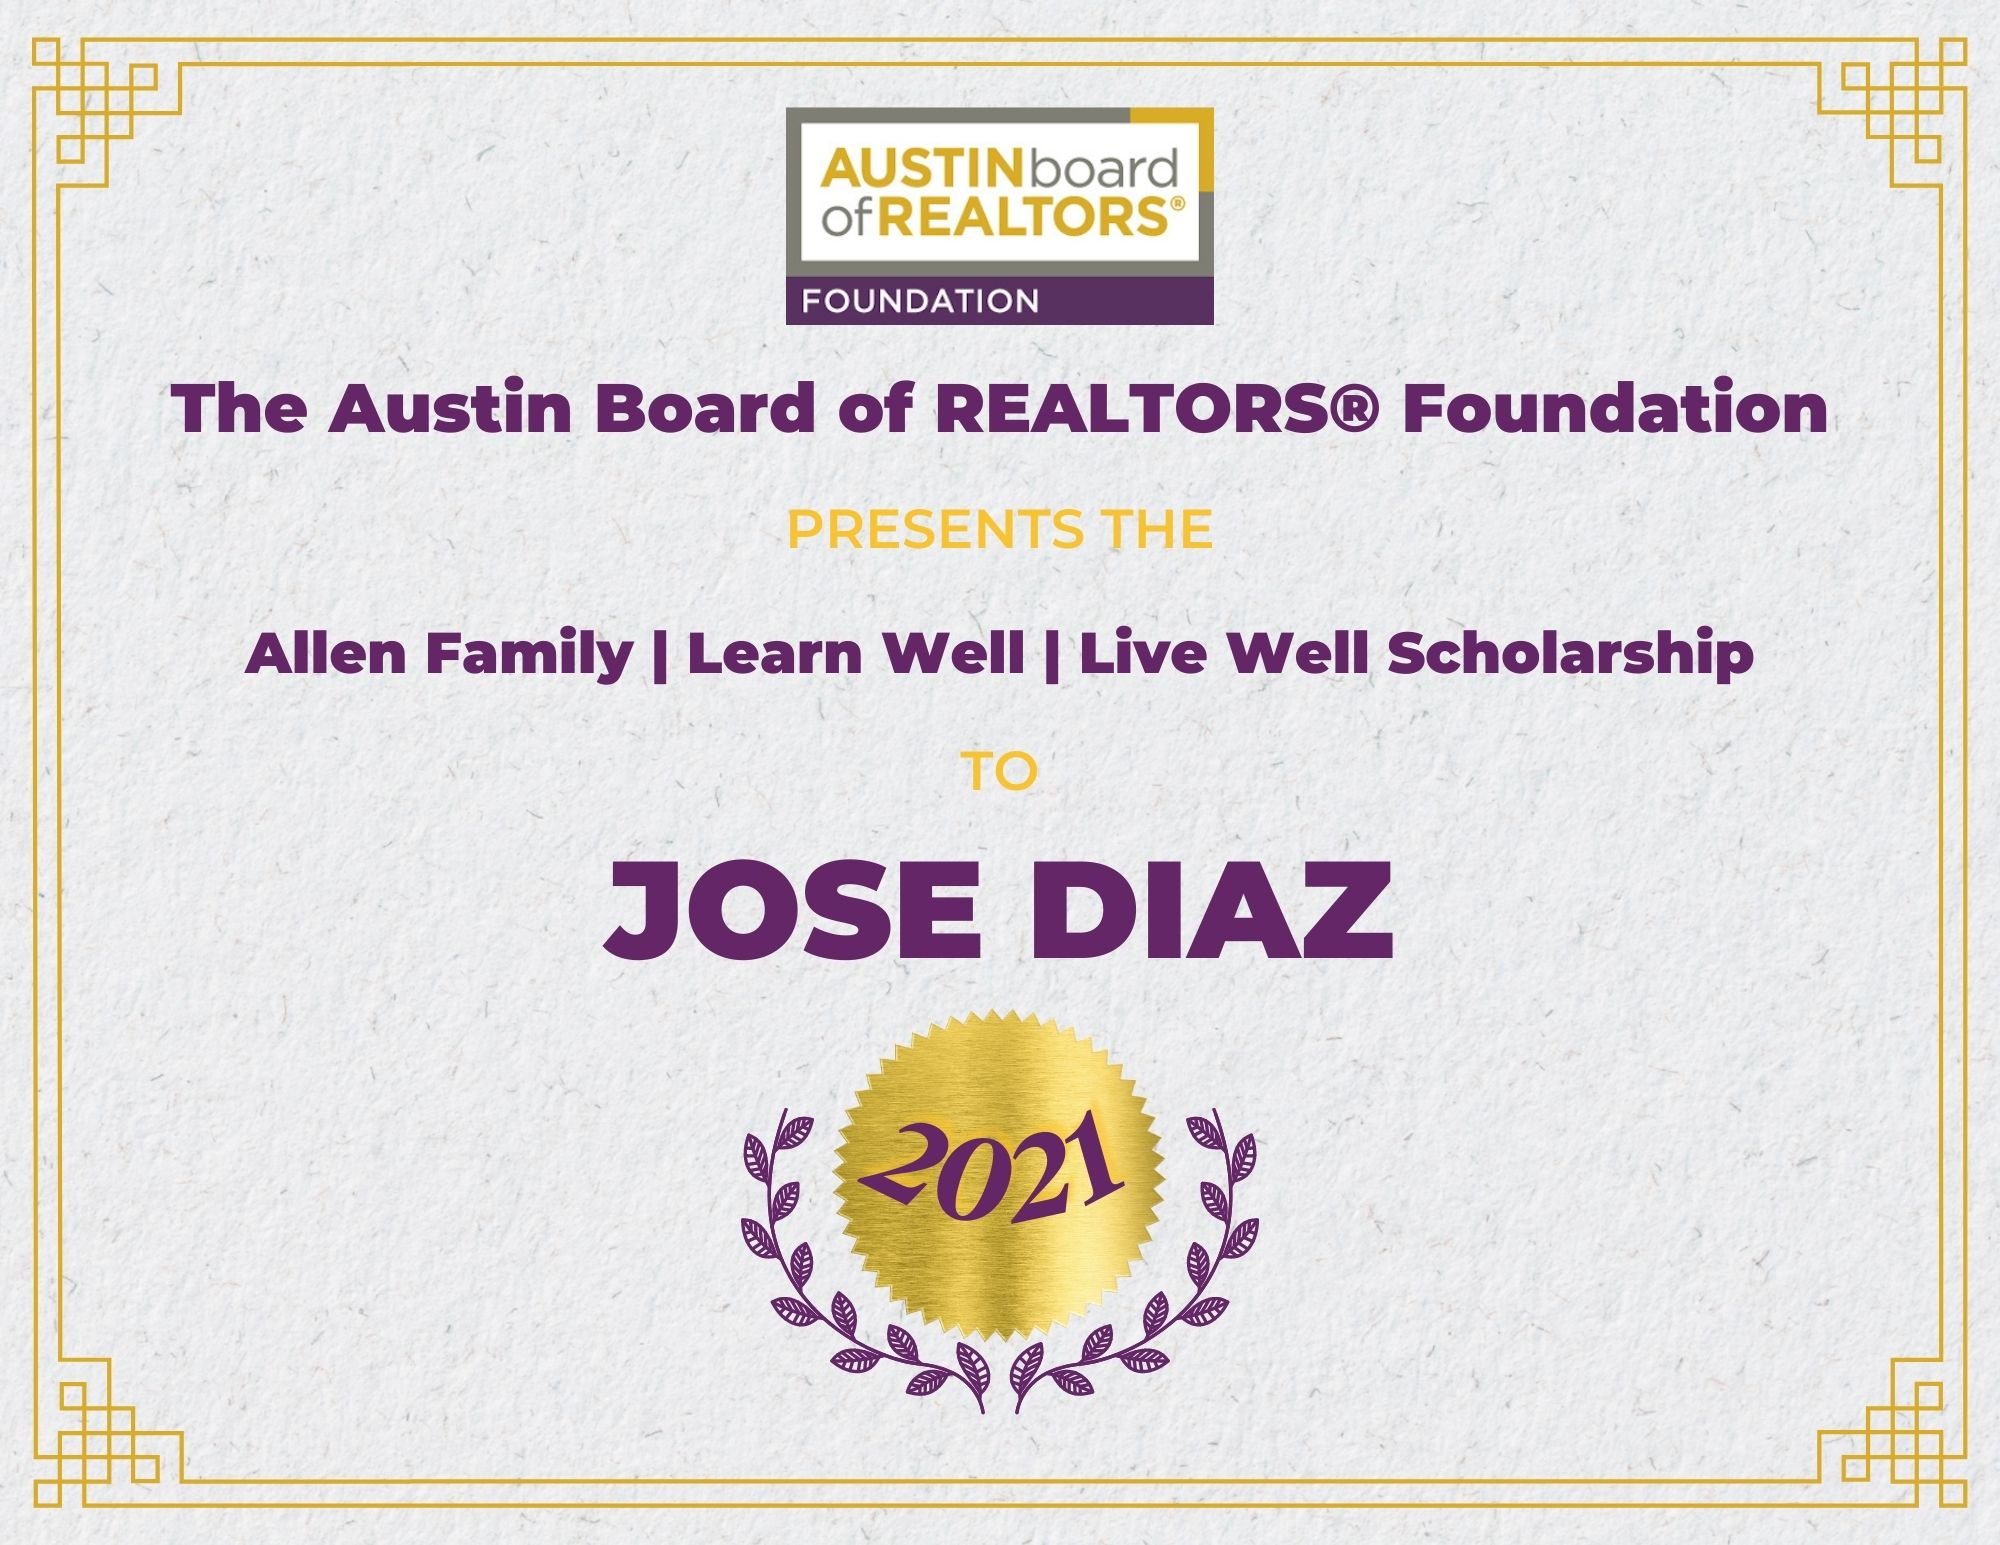 2021 Fou Scholarship Certificate Josediaz